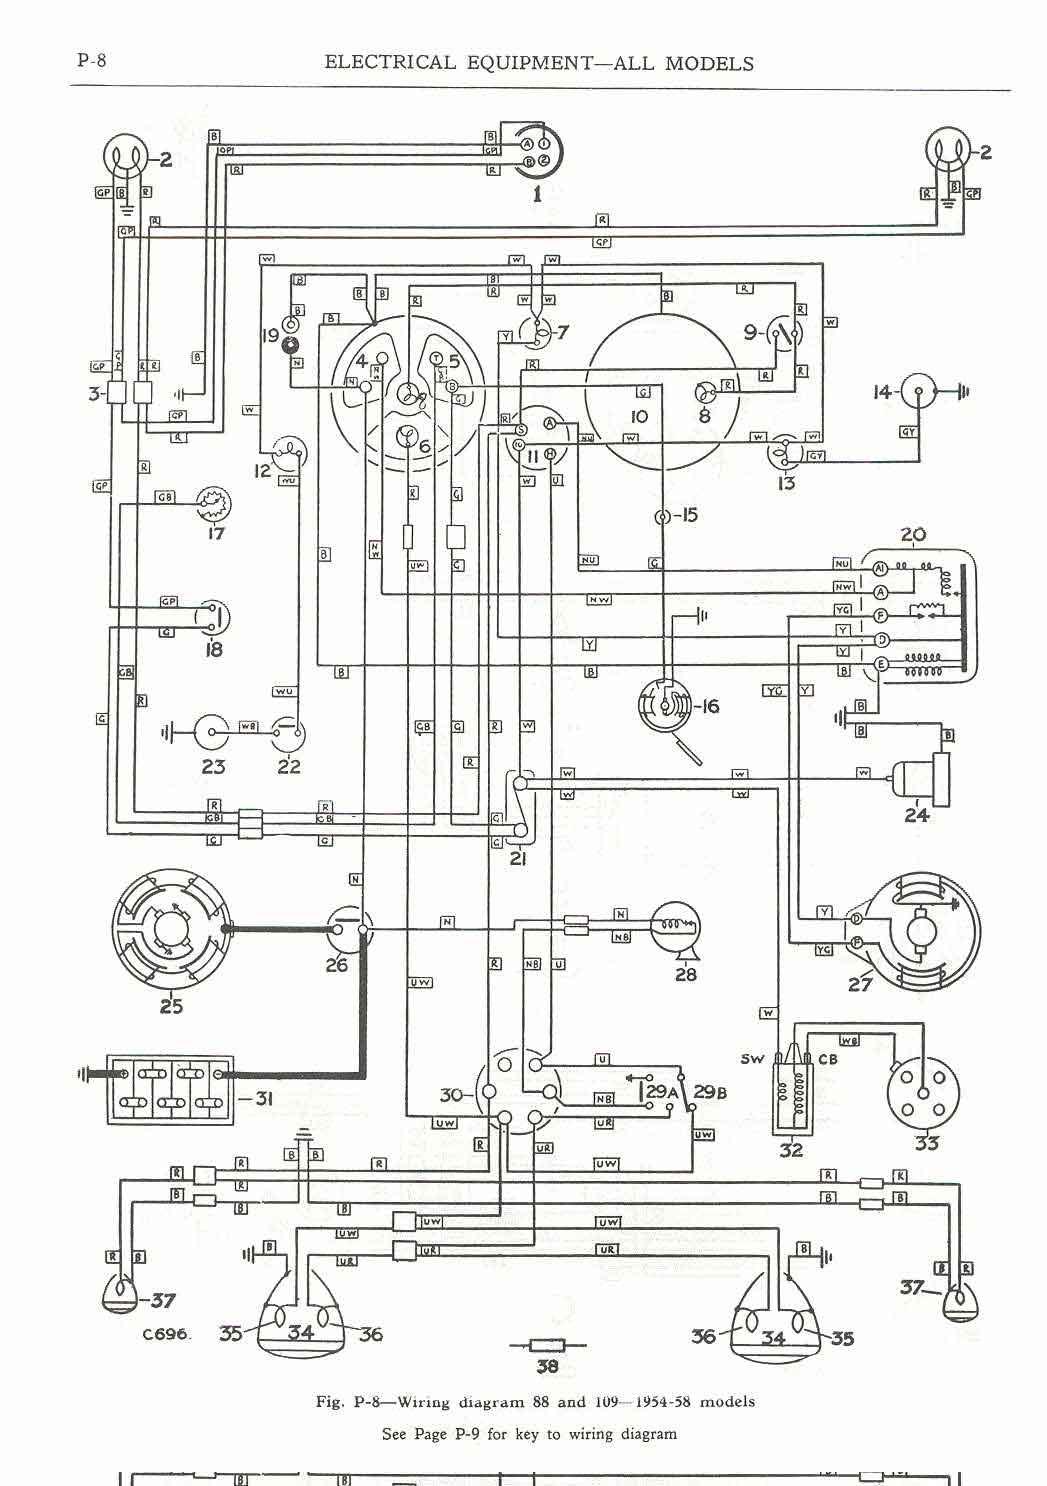 Land Rover Faq - Repair & Maintenance - Series - Electrical - Series Wiring Diagram